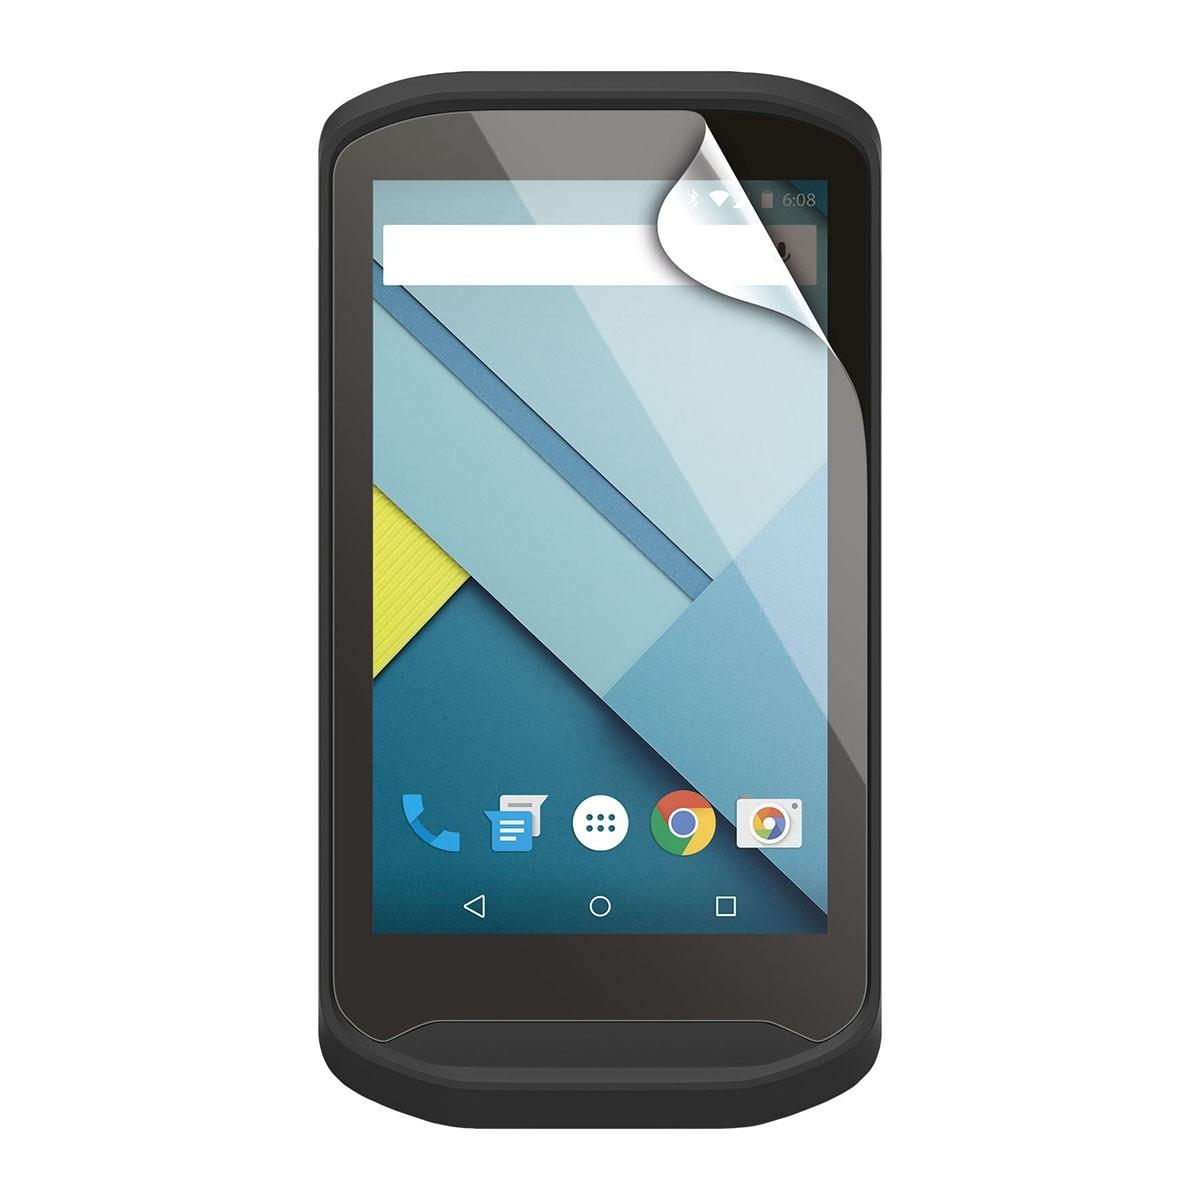 Mobilis 036134 protector de pantalla Teléfono móvil/smartphone Zebra 1 pieza(s)